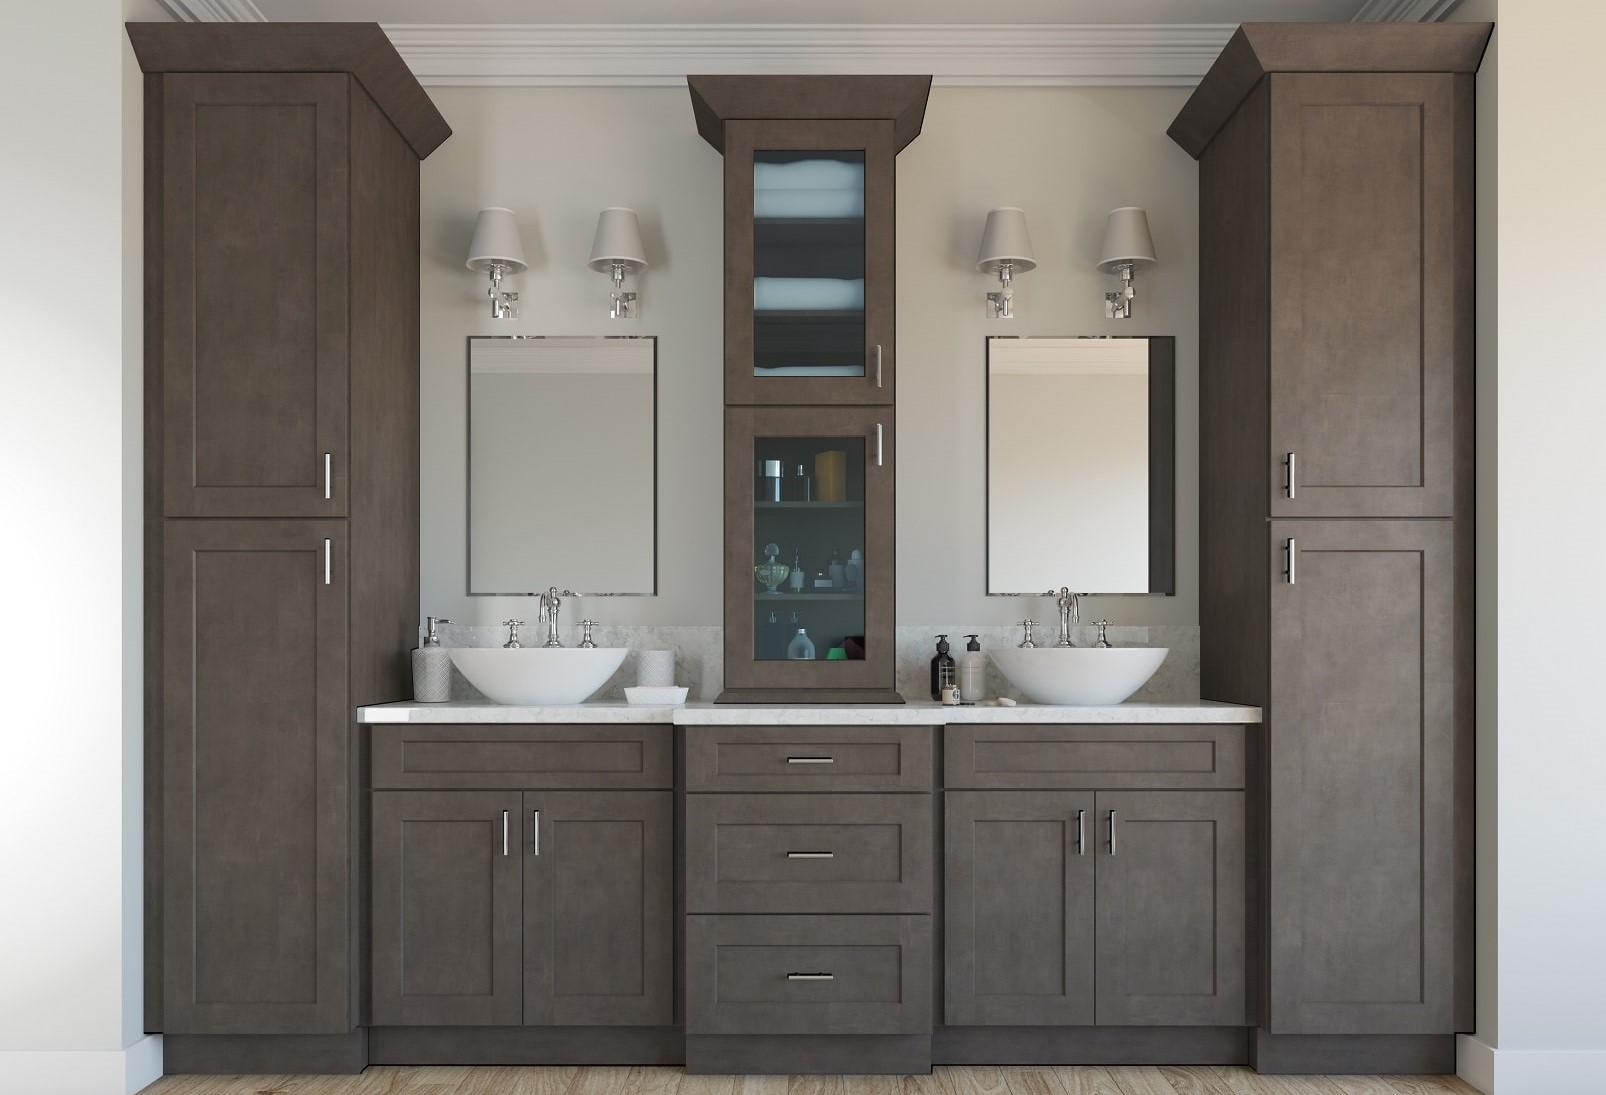 cabinets_sinks_lighting_countertops